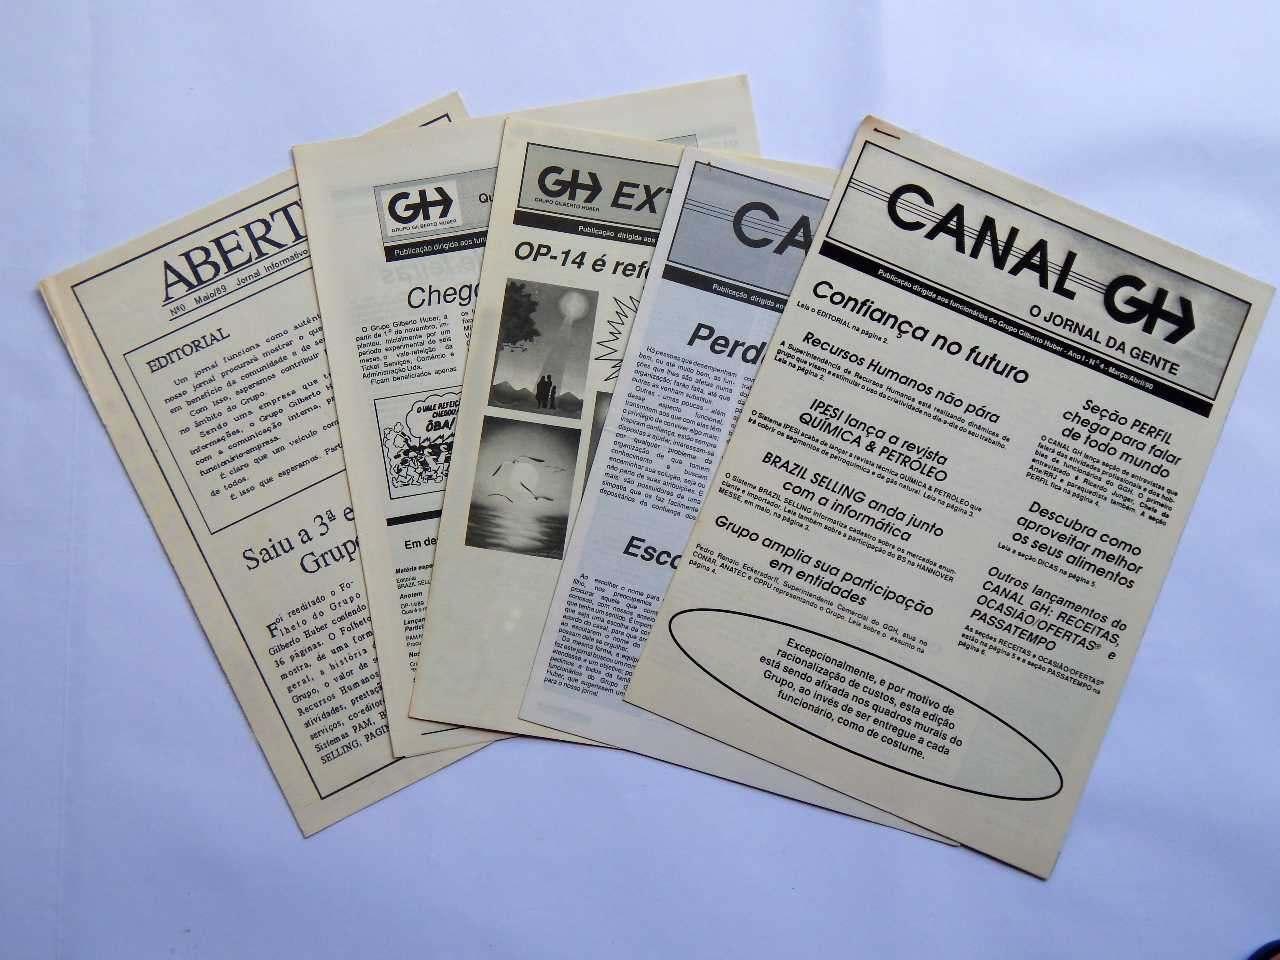 Jornal 'Canal GH'